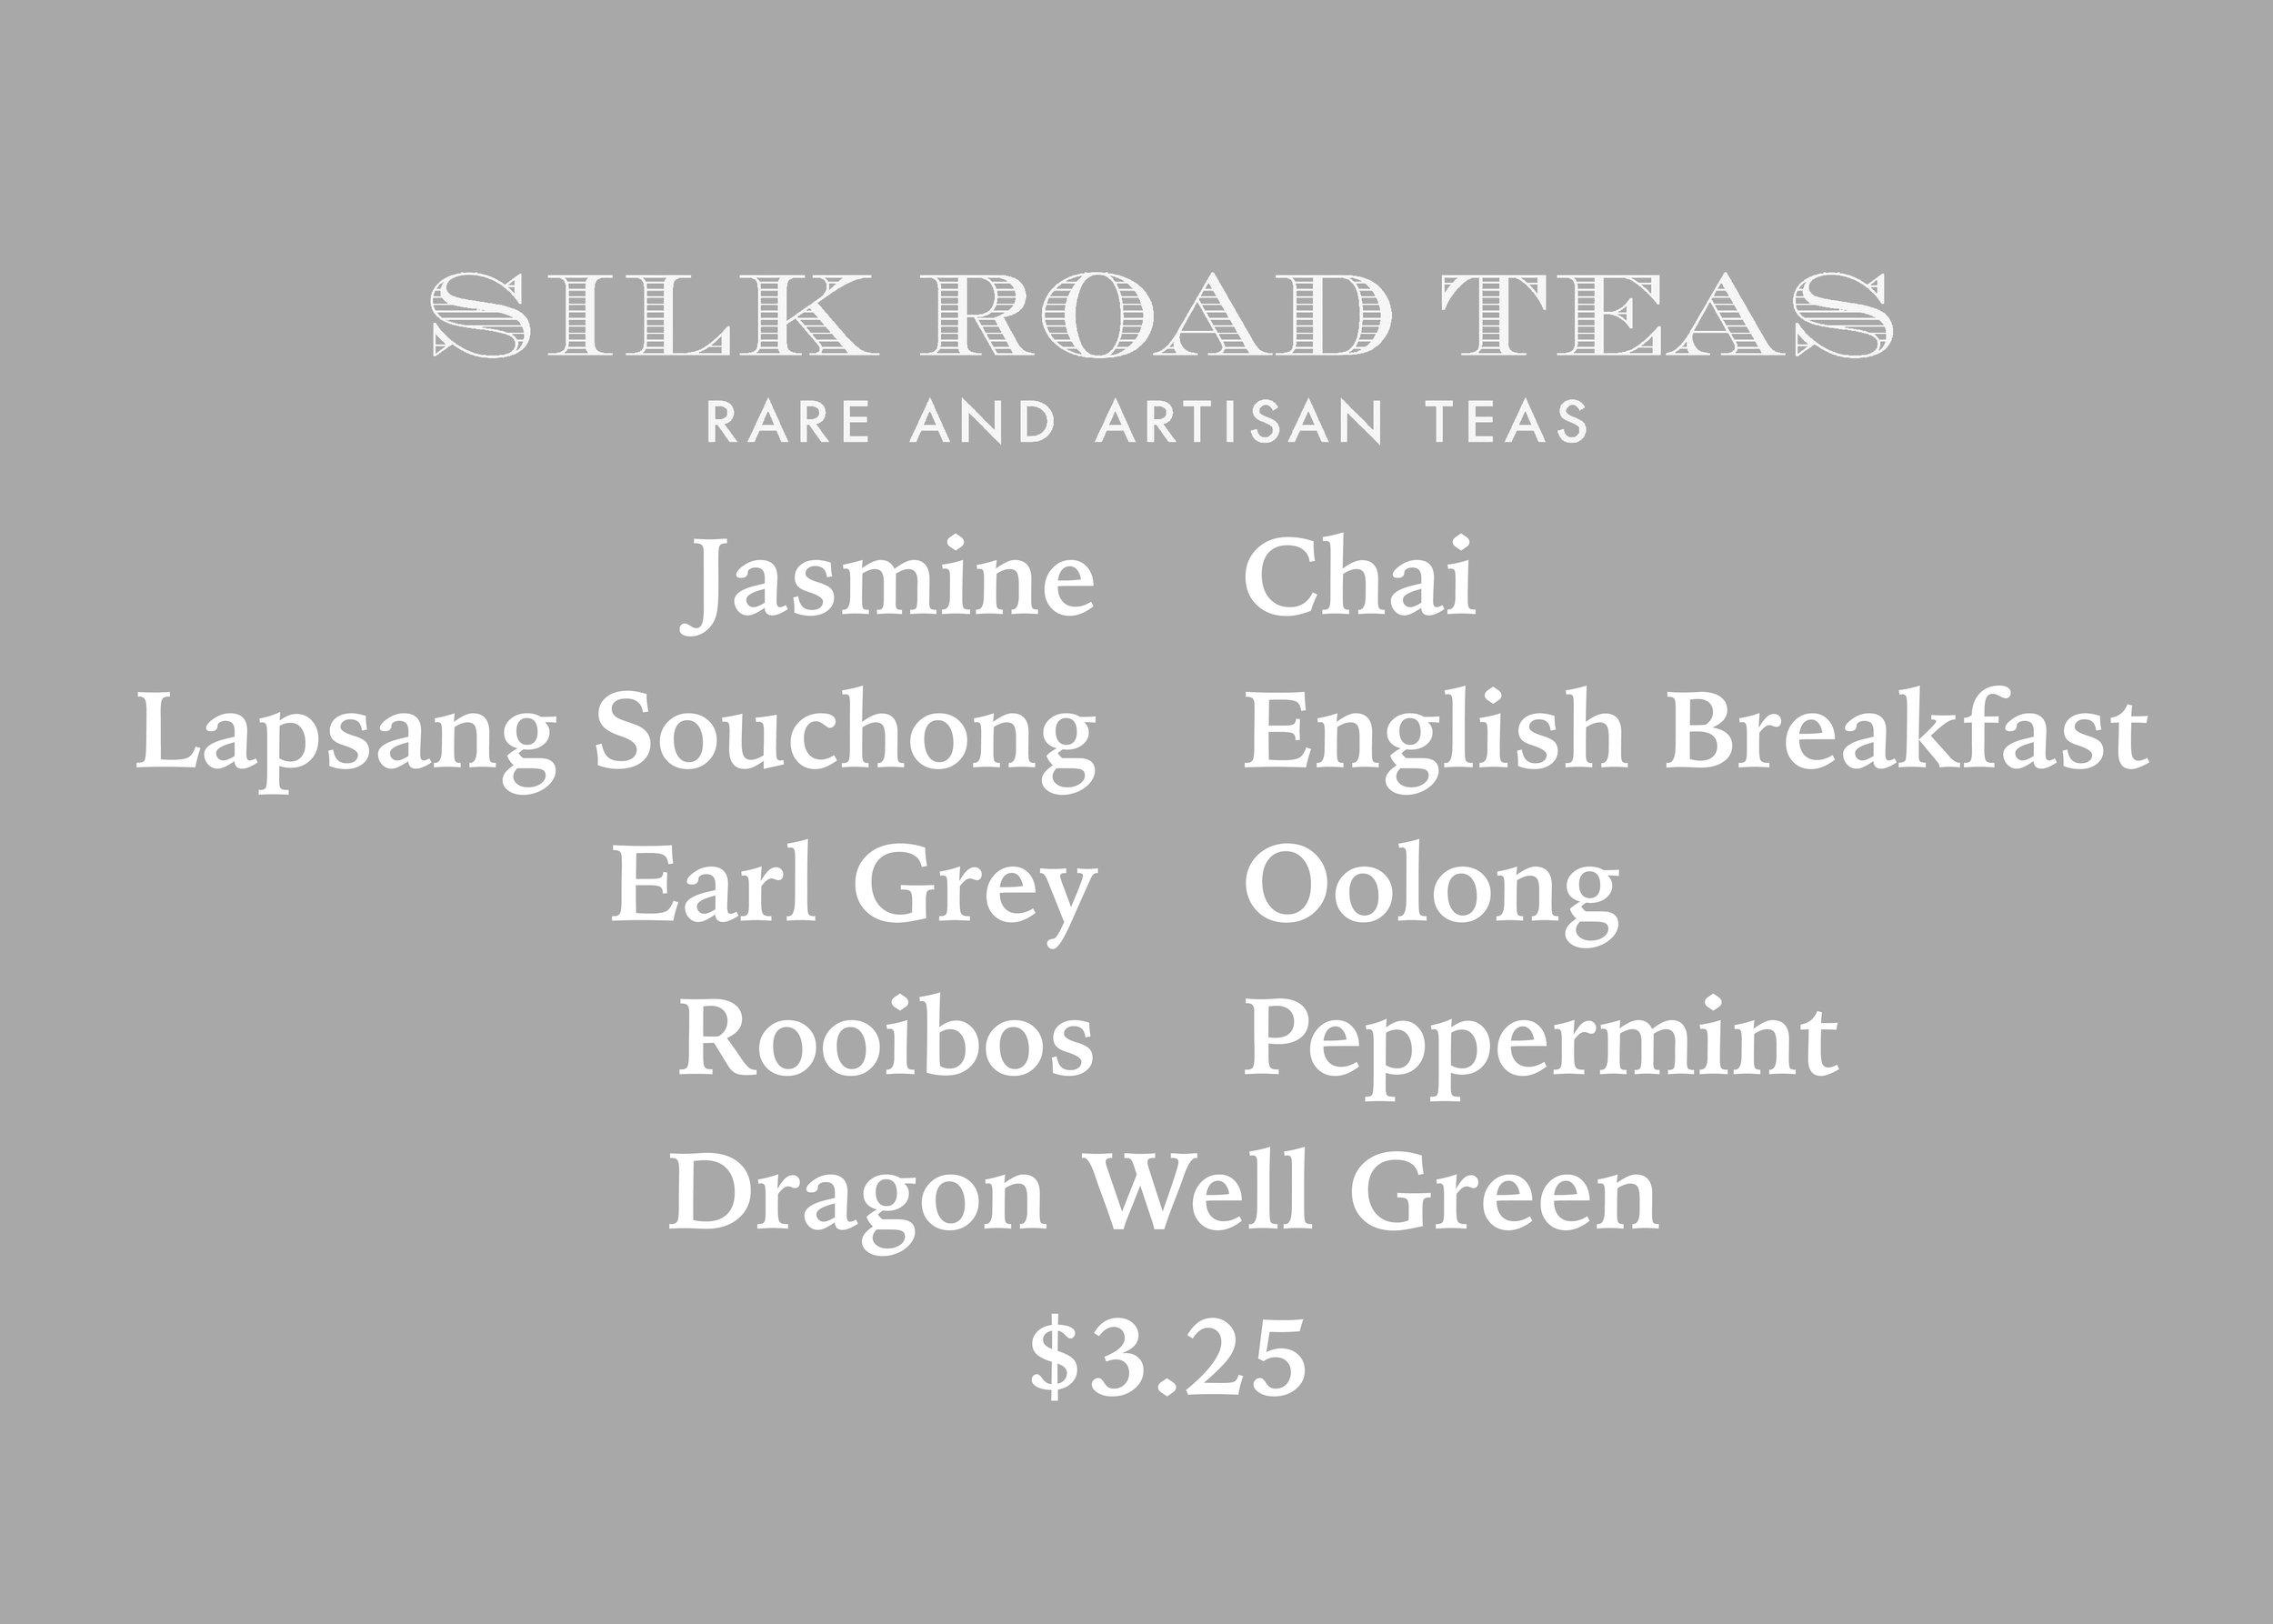 mhbb silk road tea signs.jpg